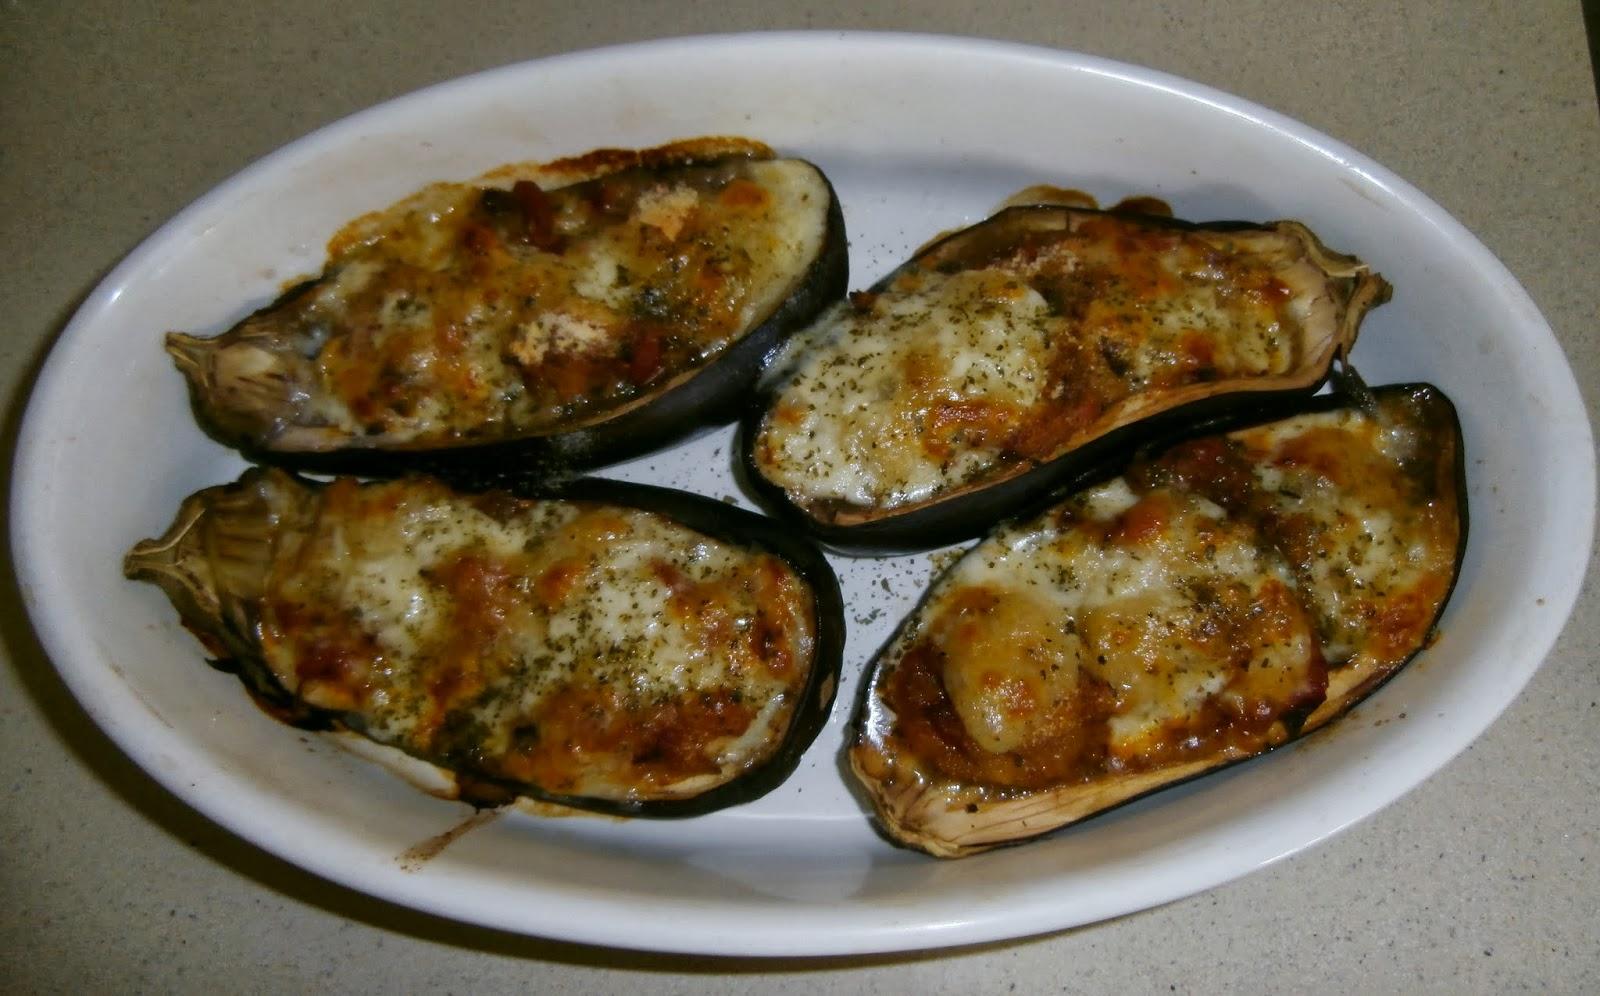 Una f sica en la cocina berenjenas rellenas al horno con mozzarella - Berenjenas rellenas al horno ...